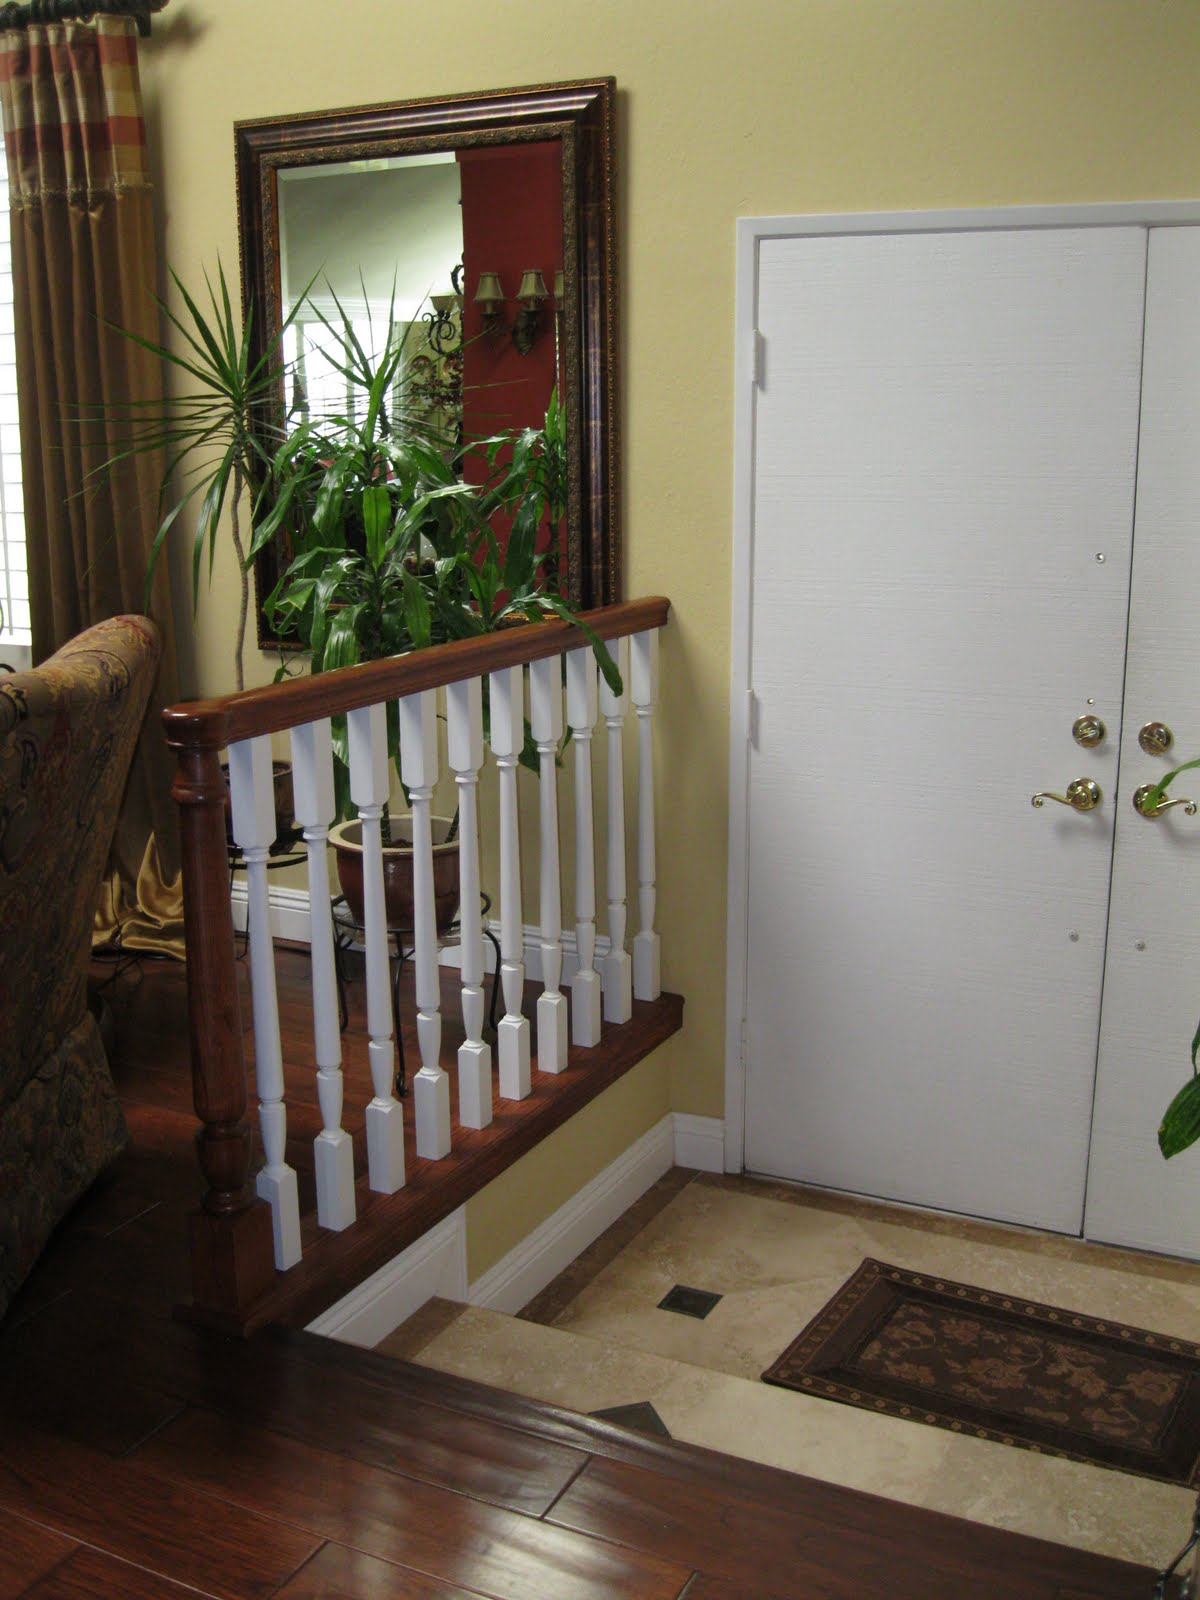 Redoing Hardwood Floors (refinishing, appliance, stained, molding